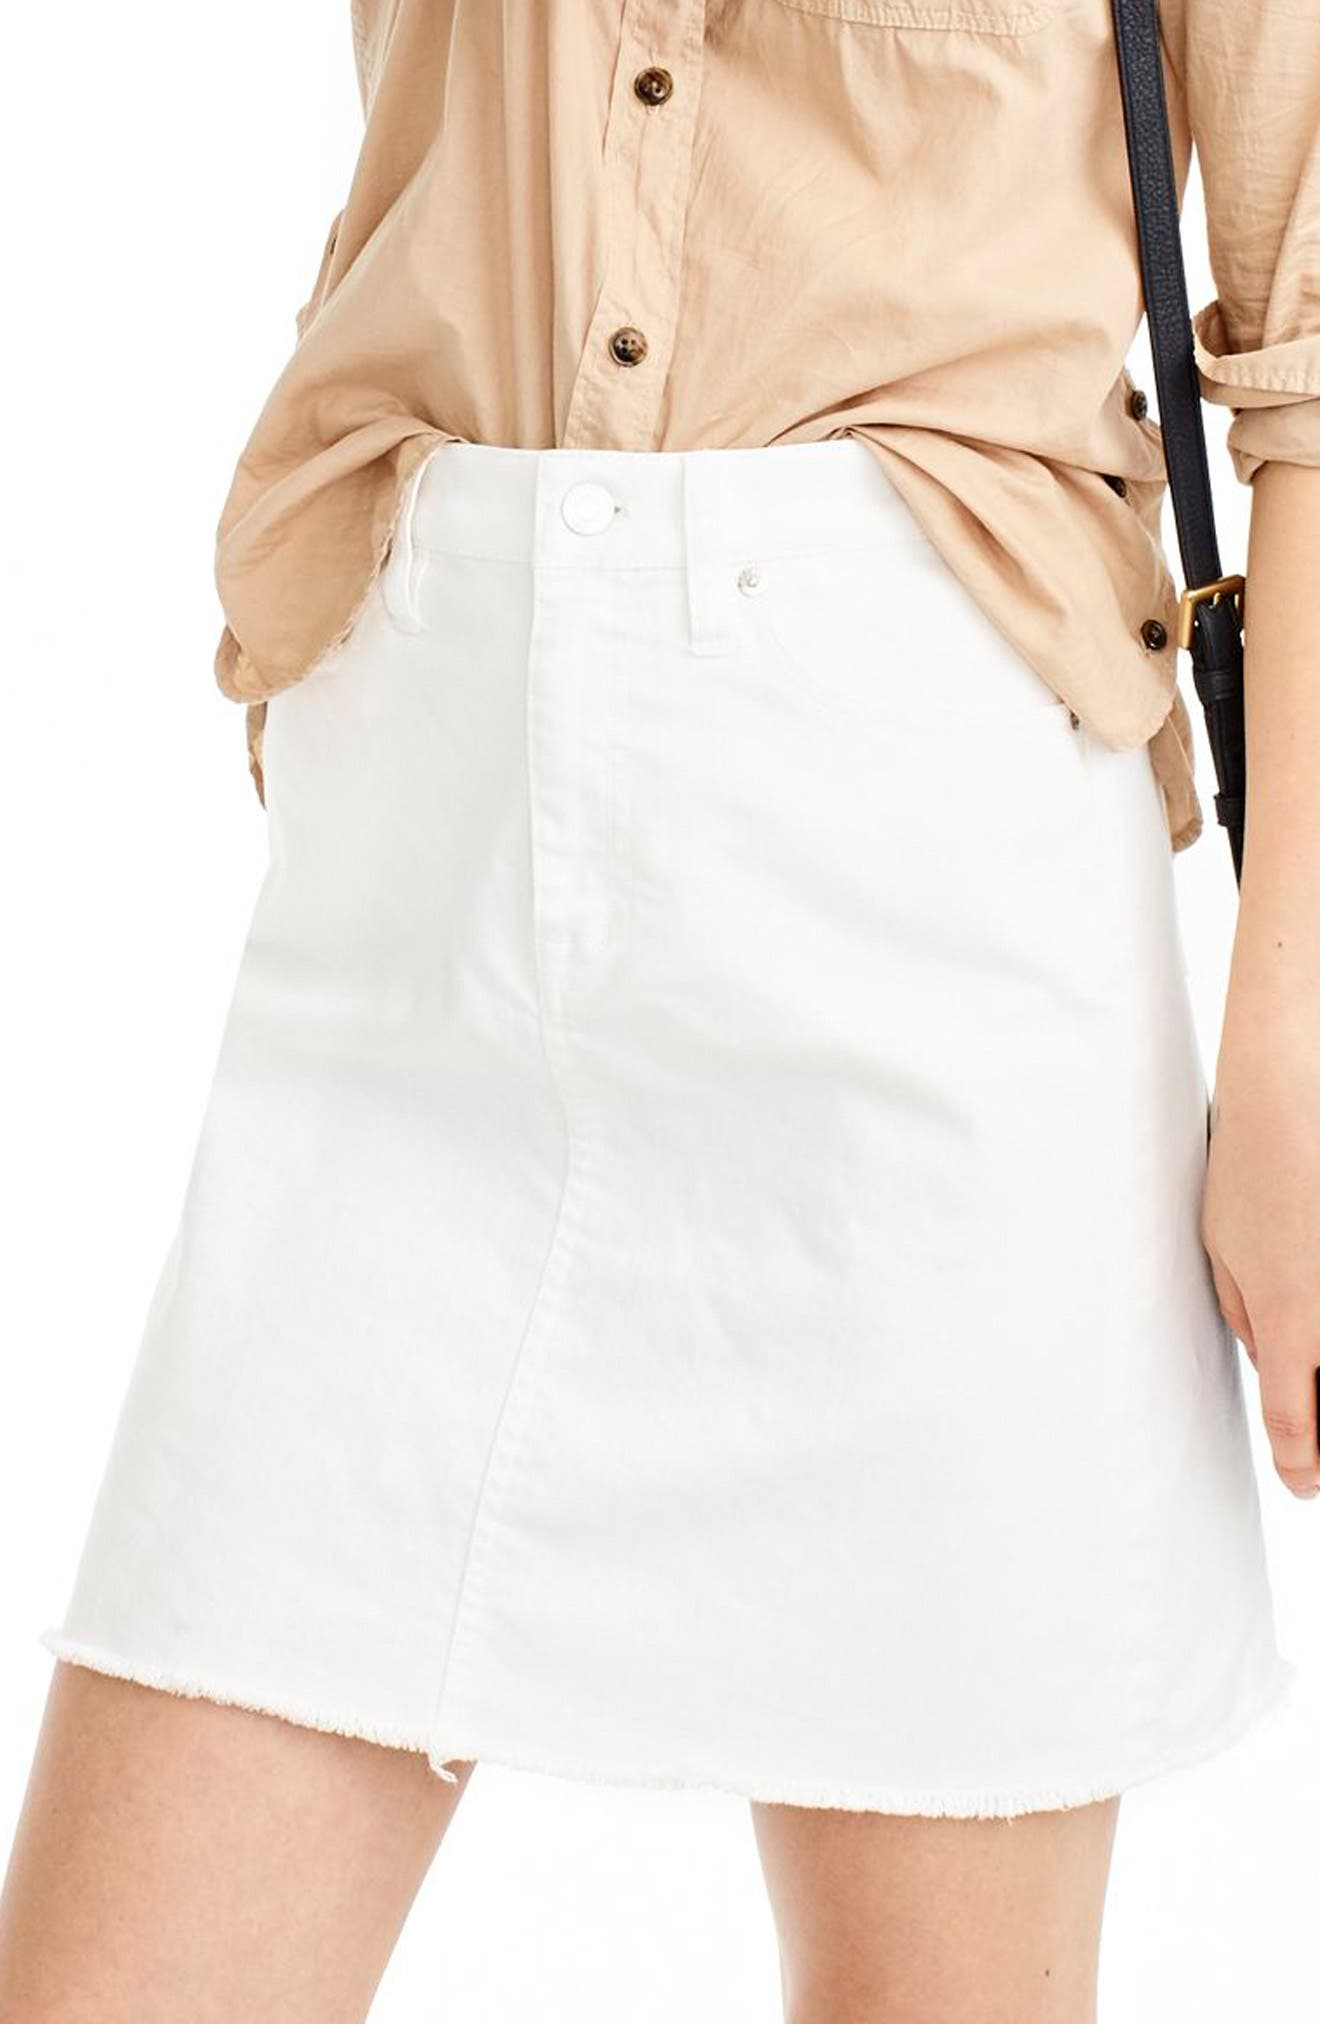 J.Crew Let-Out Hem Denim Skirt (Regular & Petite)